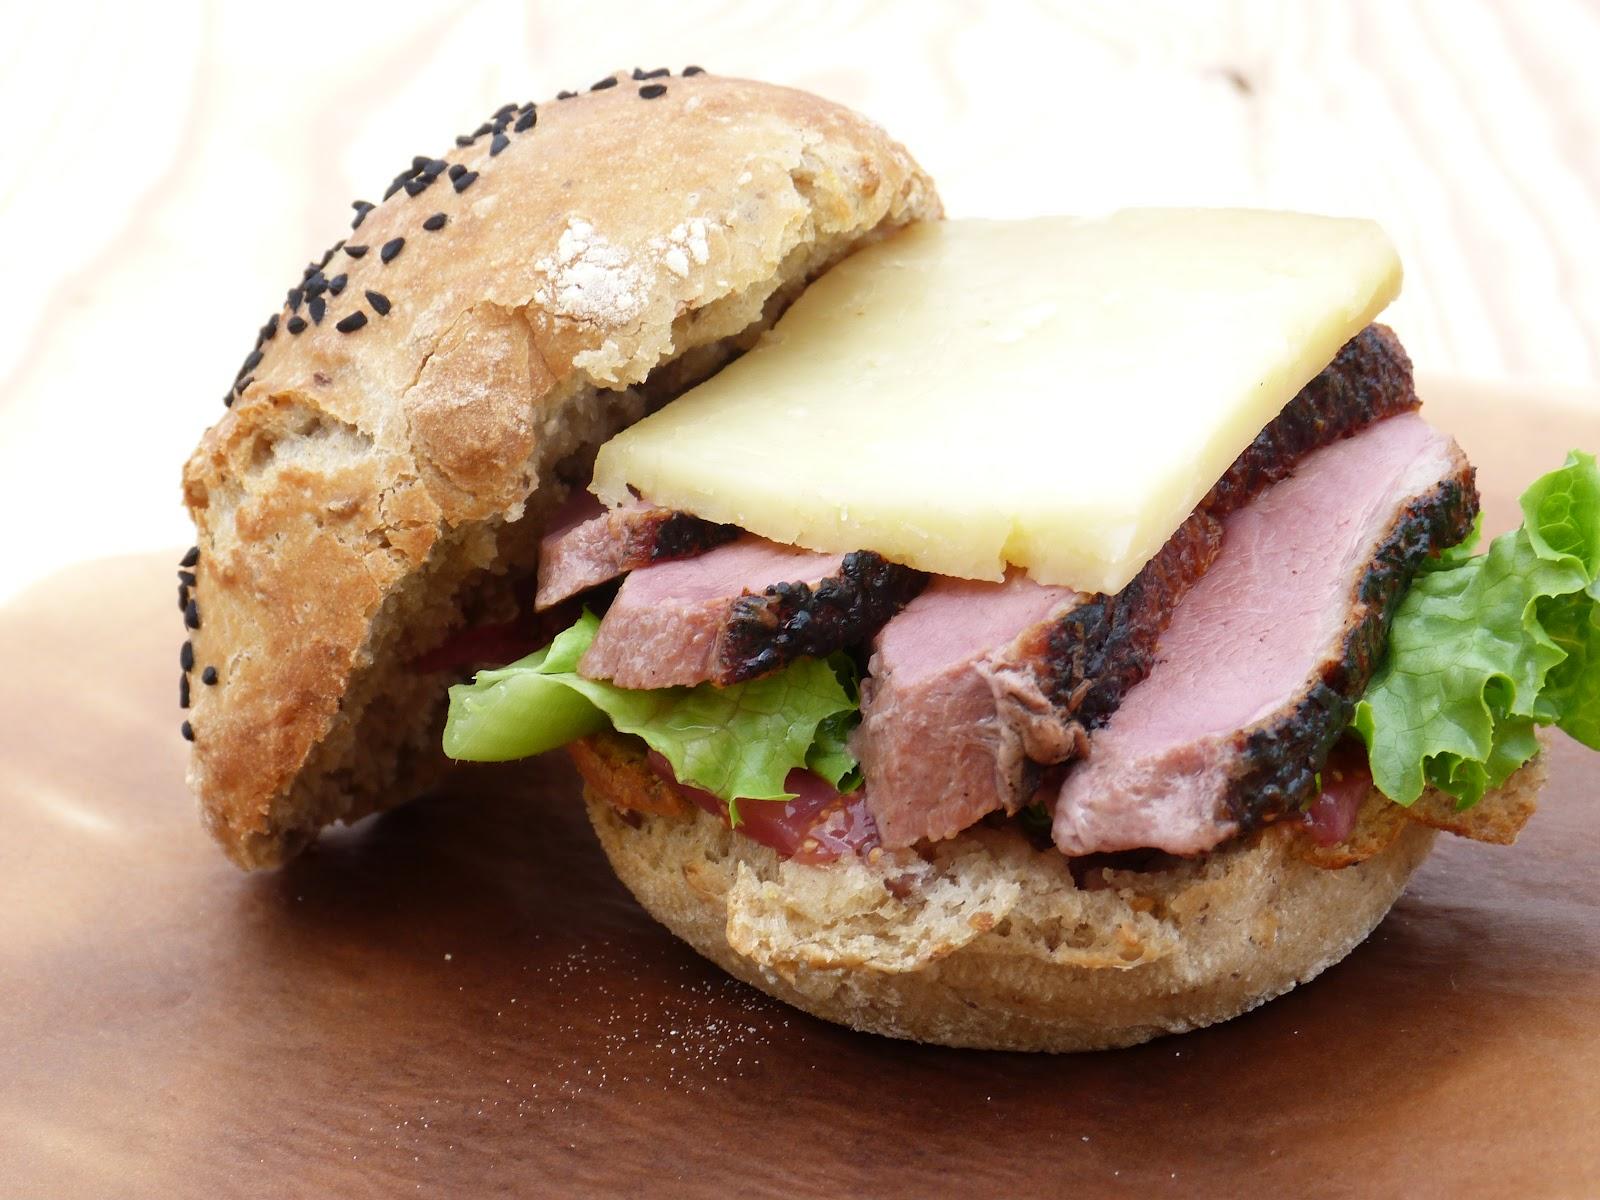 chic chic chocolat hamburger au magret de canard et chutney de figues. Black Bedroom Furniture Sets. Home Design Ideas